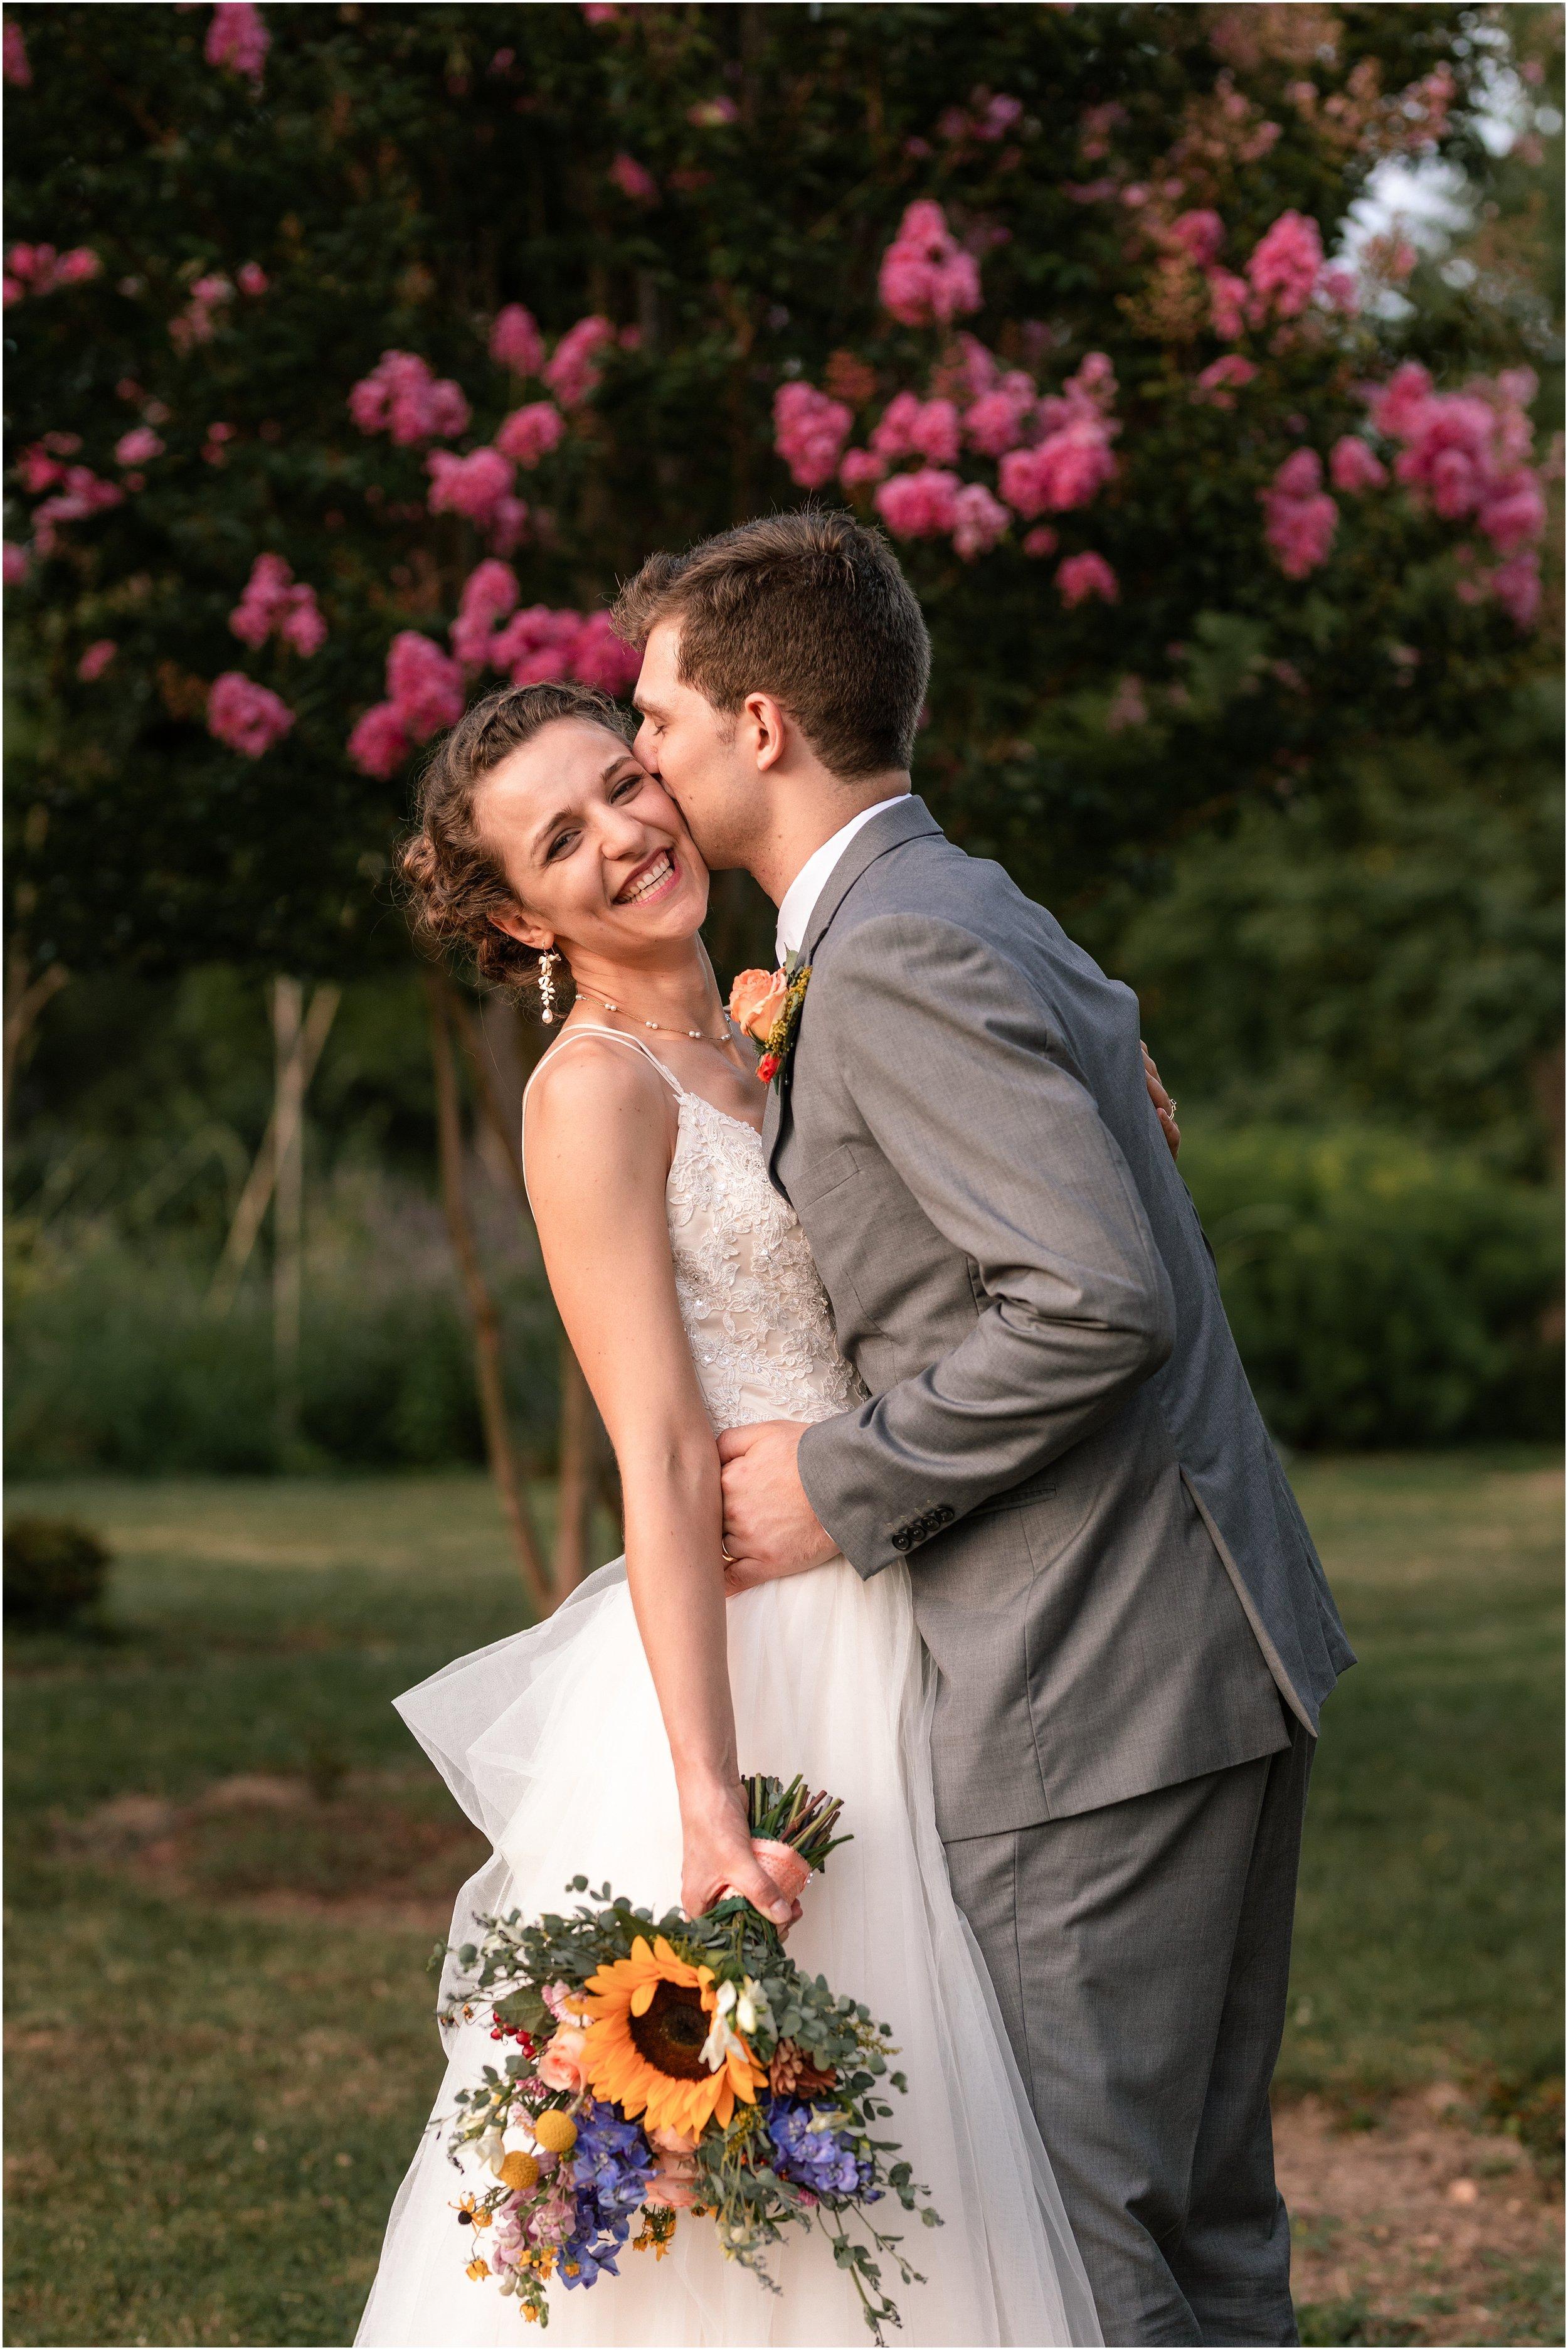 hannah leigh photography Cylburn Arboretum Wedding Baltimore, MD_3473.jpg